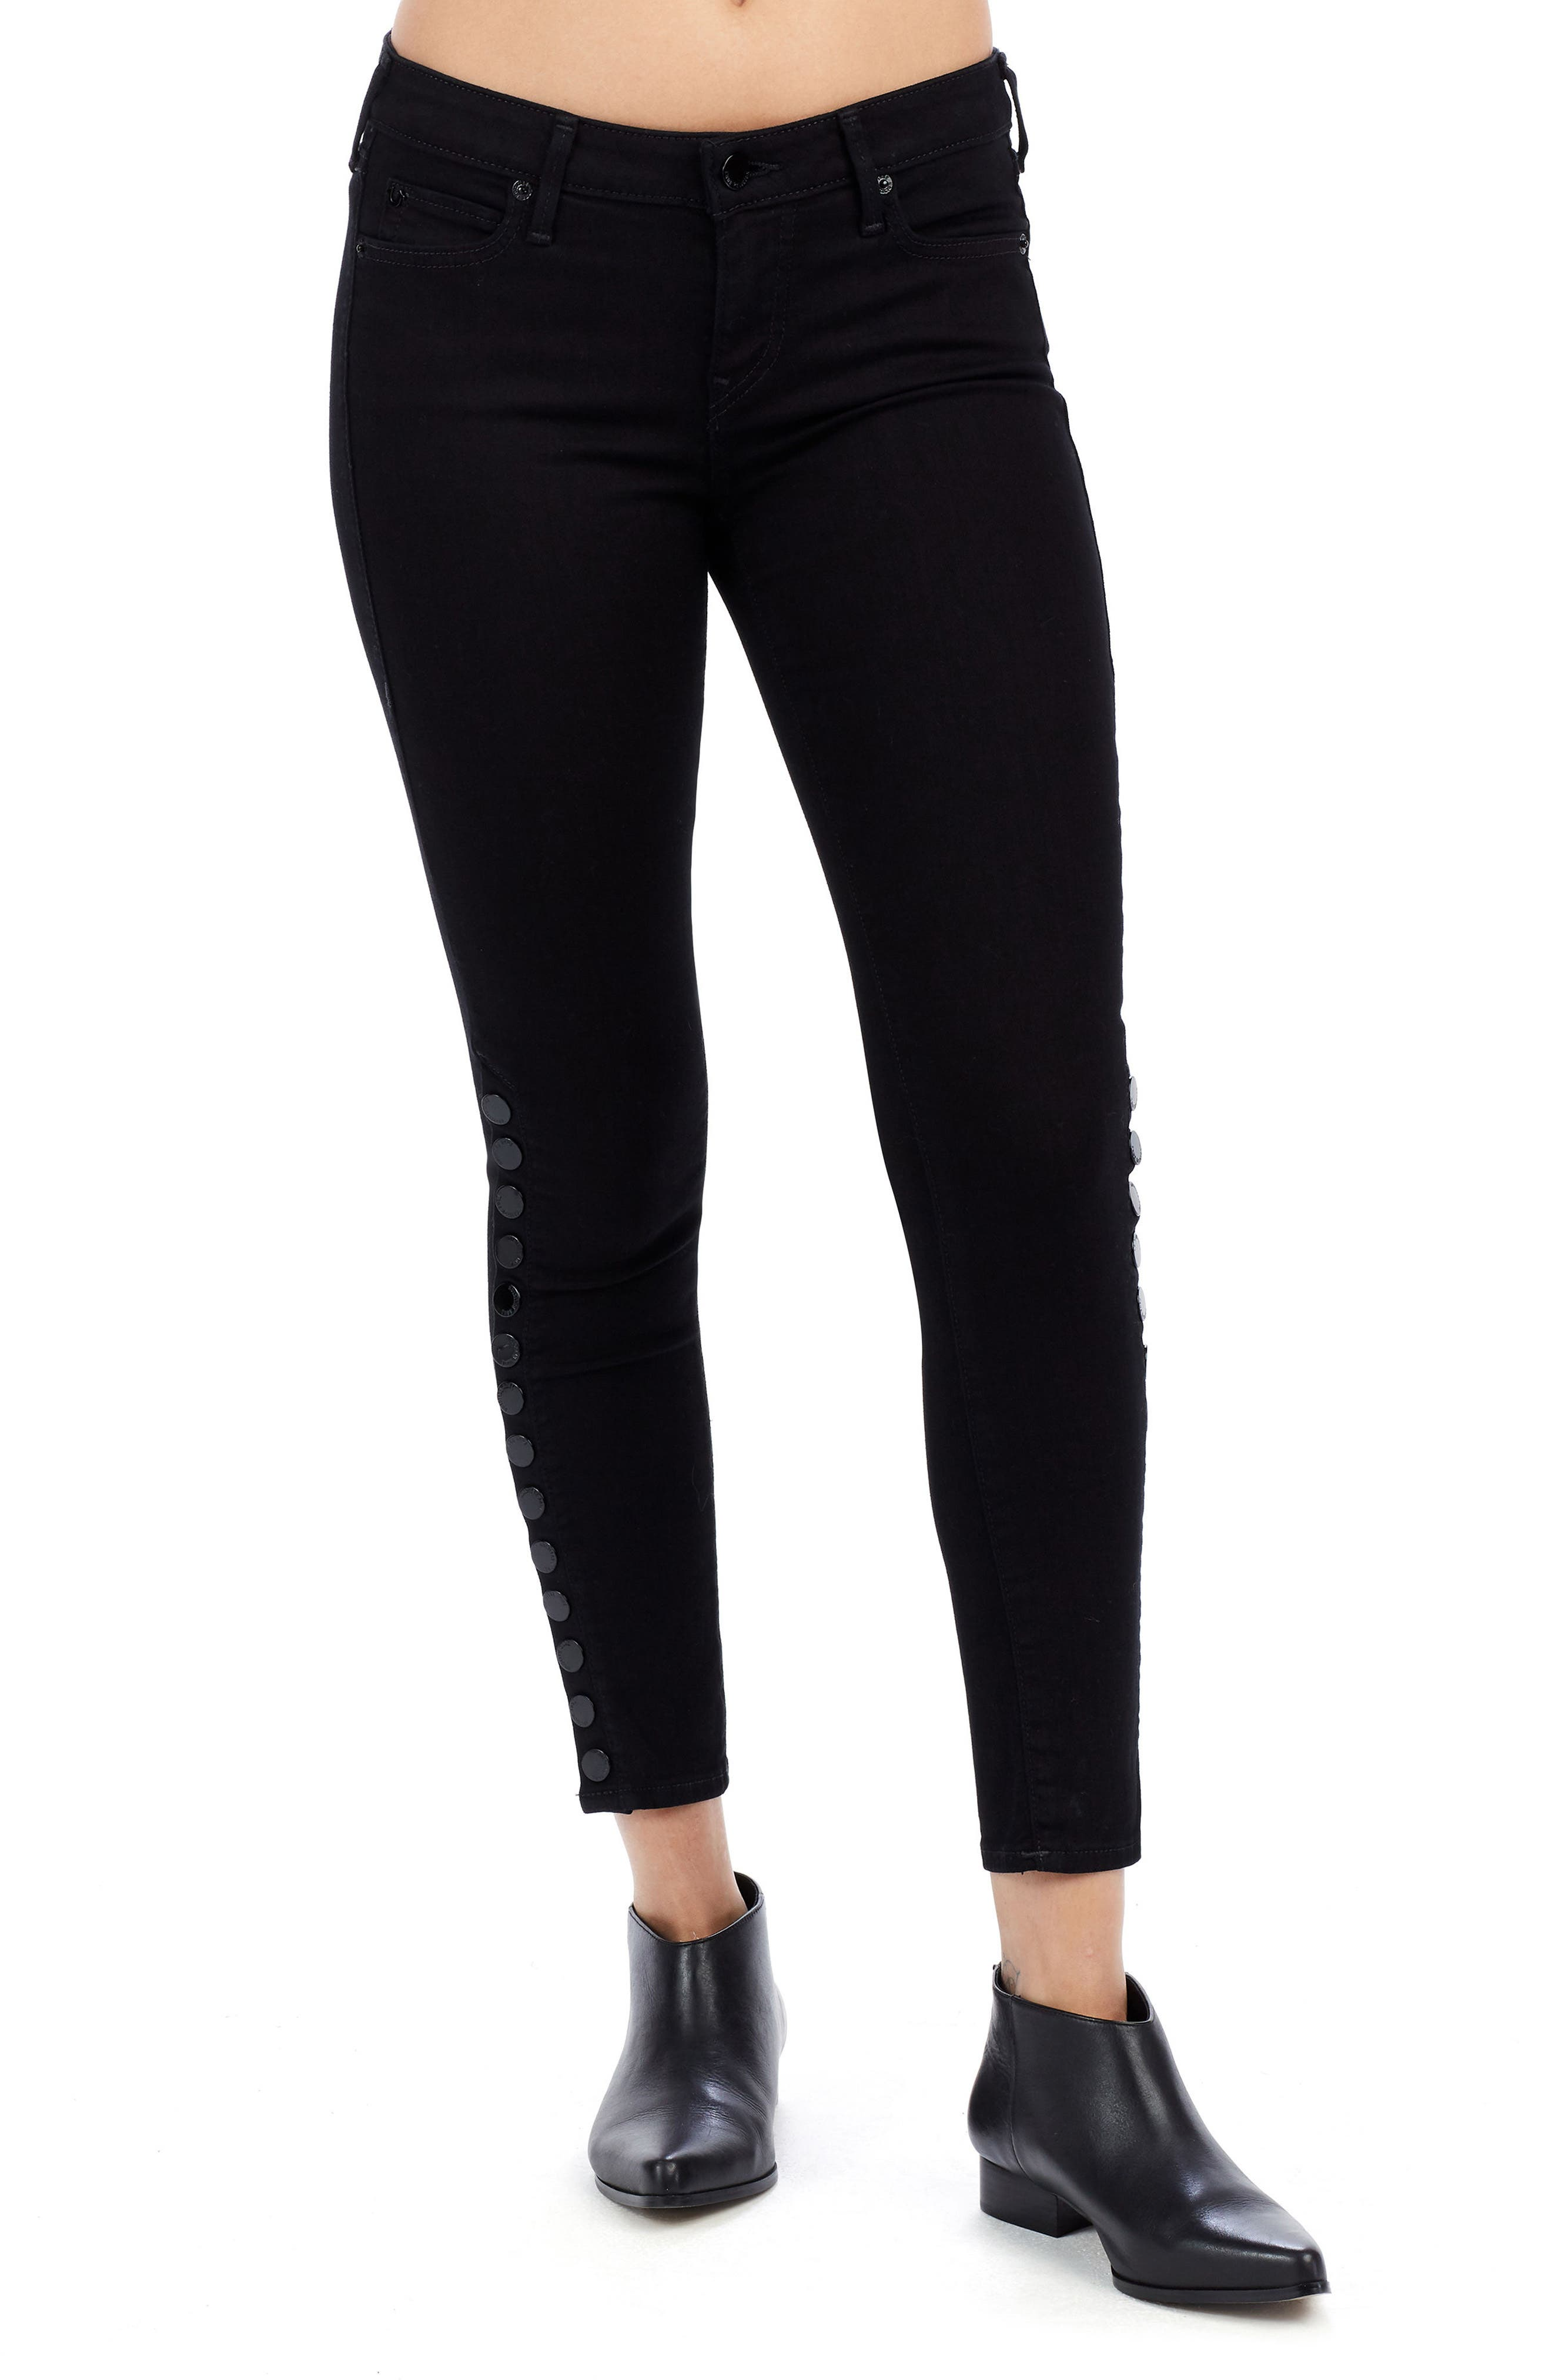 Main Image - True Religion Brand Jeans Halle Snap Ankle Super Skinny Jeans (Jet Black)